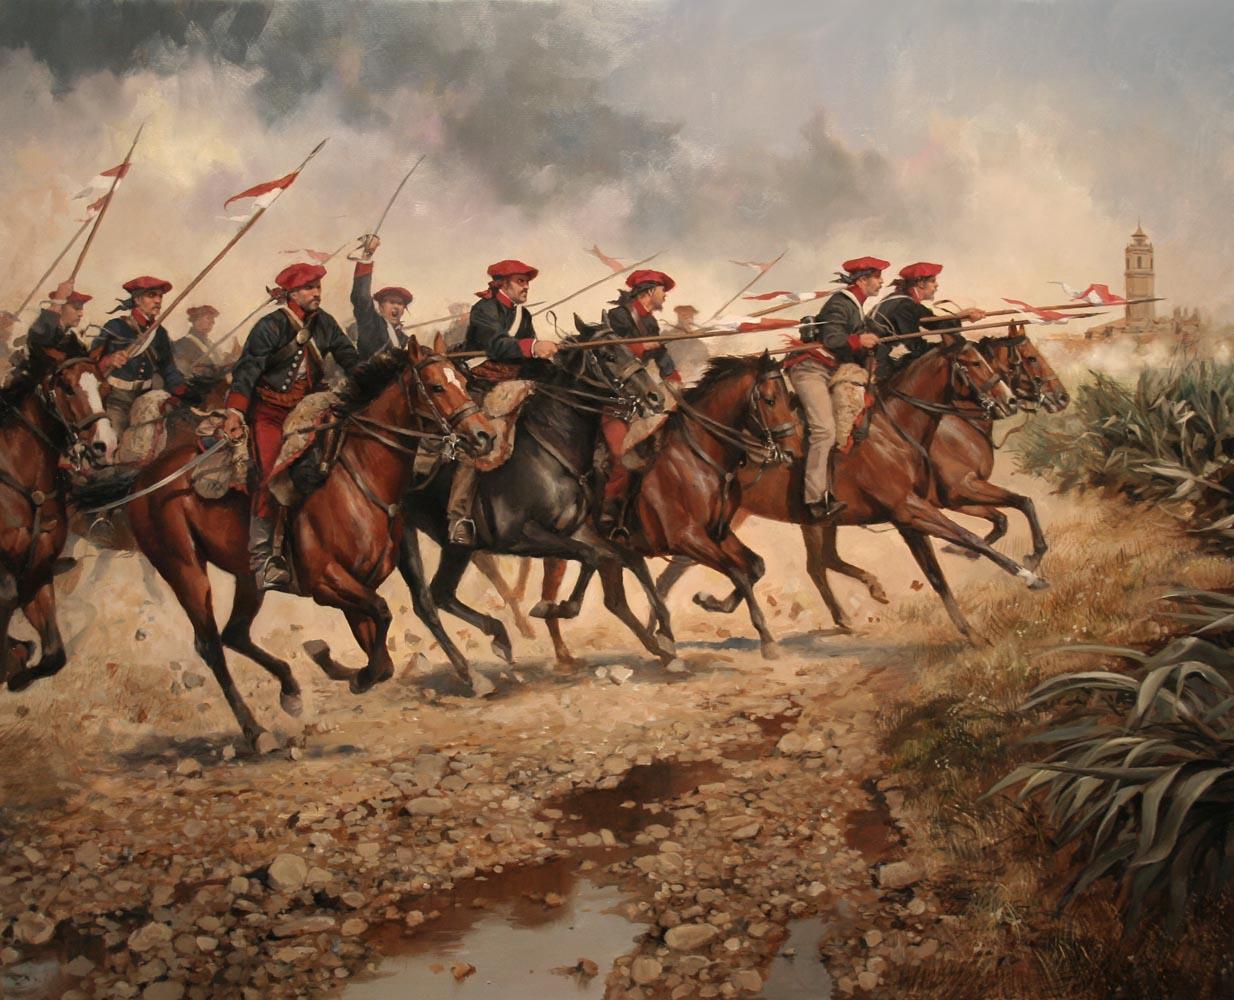 [Napoleonic Wars] España s.XIX 1ªGuerra Carlista - Página 2 En%2Bcastellon%2Bred1